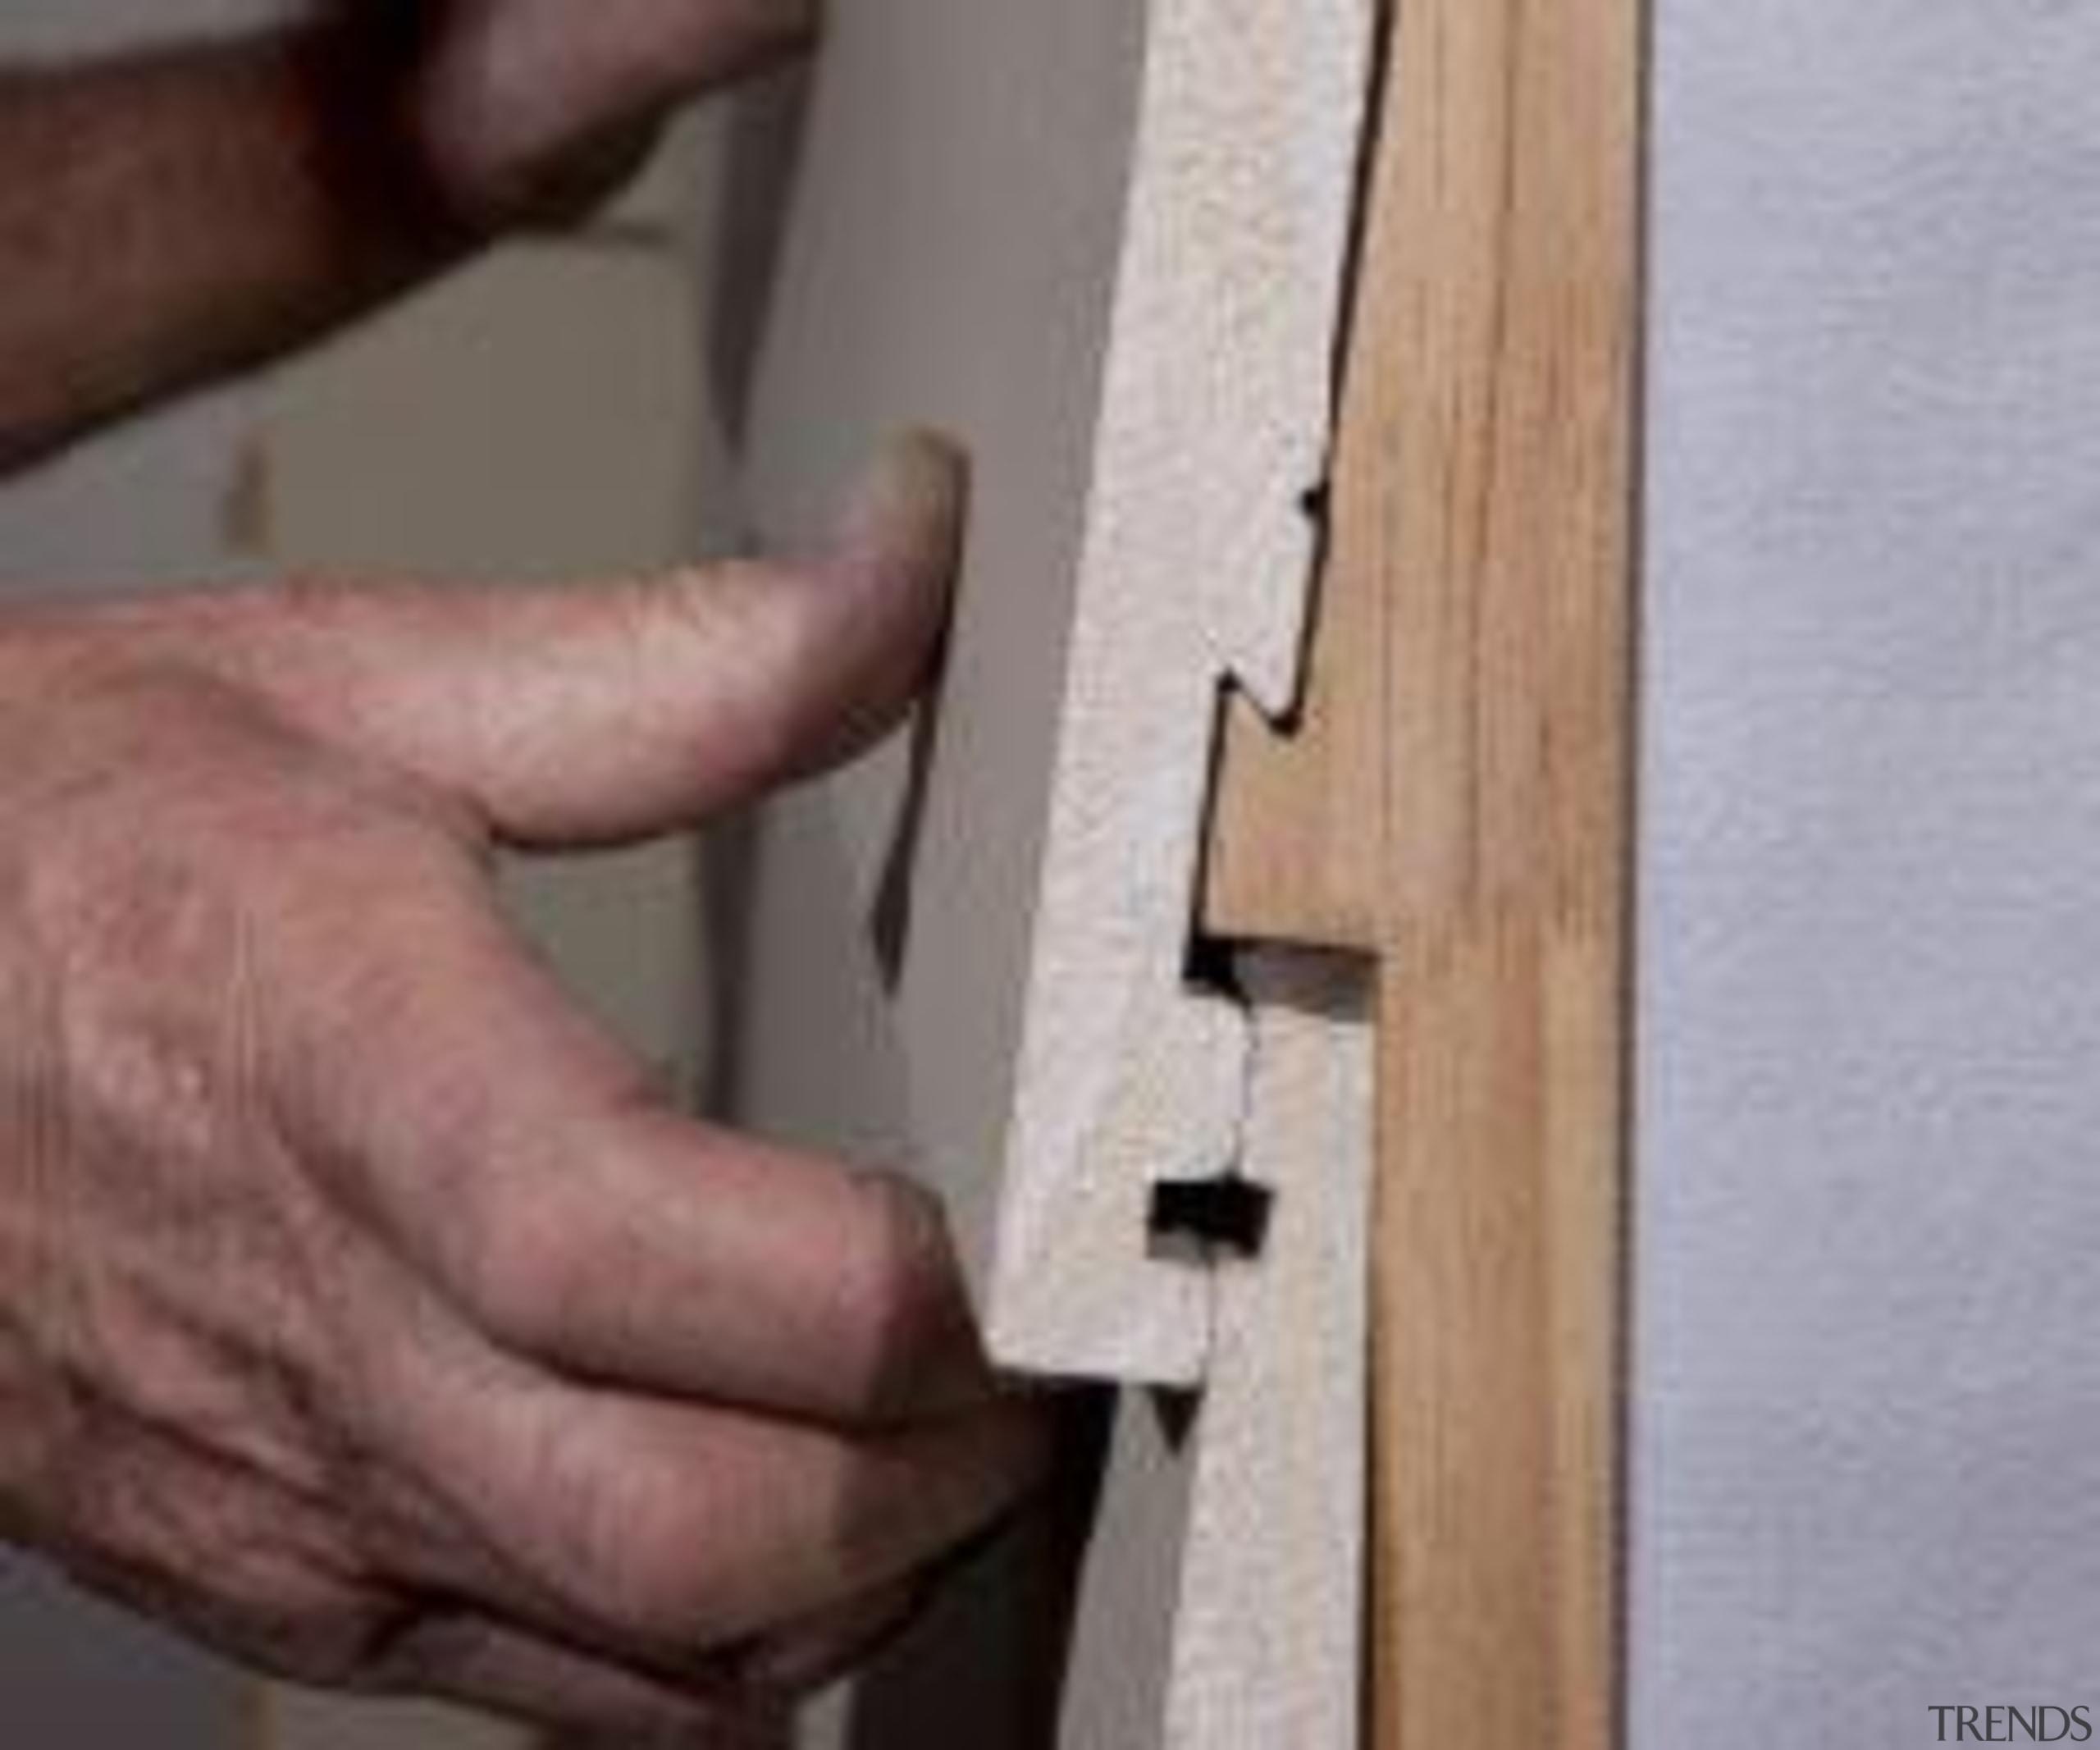 A-lign Concealed Fix - A-lign Concealed Fix - angle, wood, gray